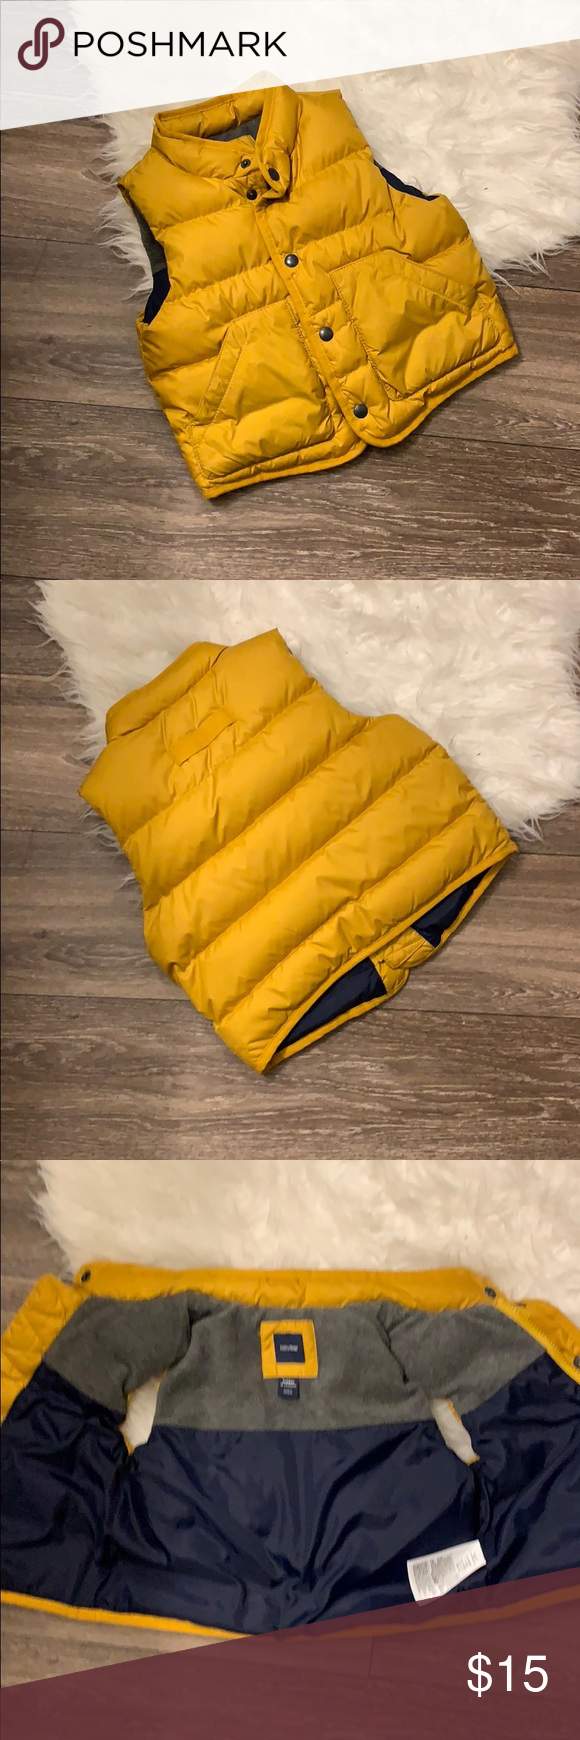 7798000663dd 🌟 Baby Gap Winter Puff Vest 🌟